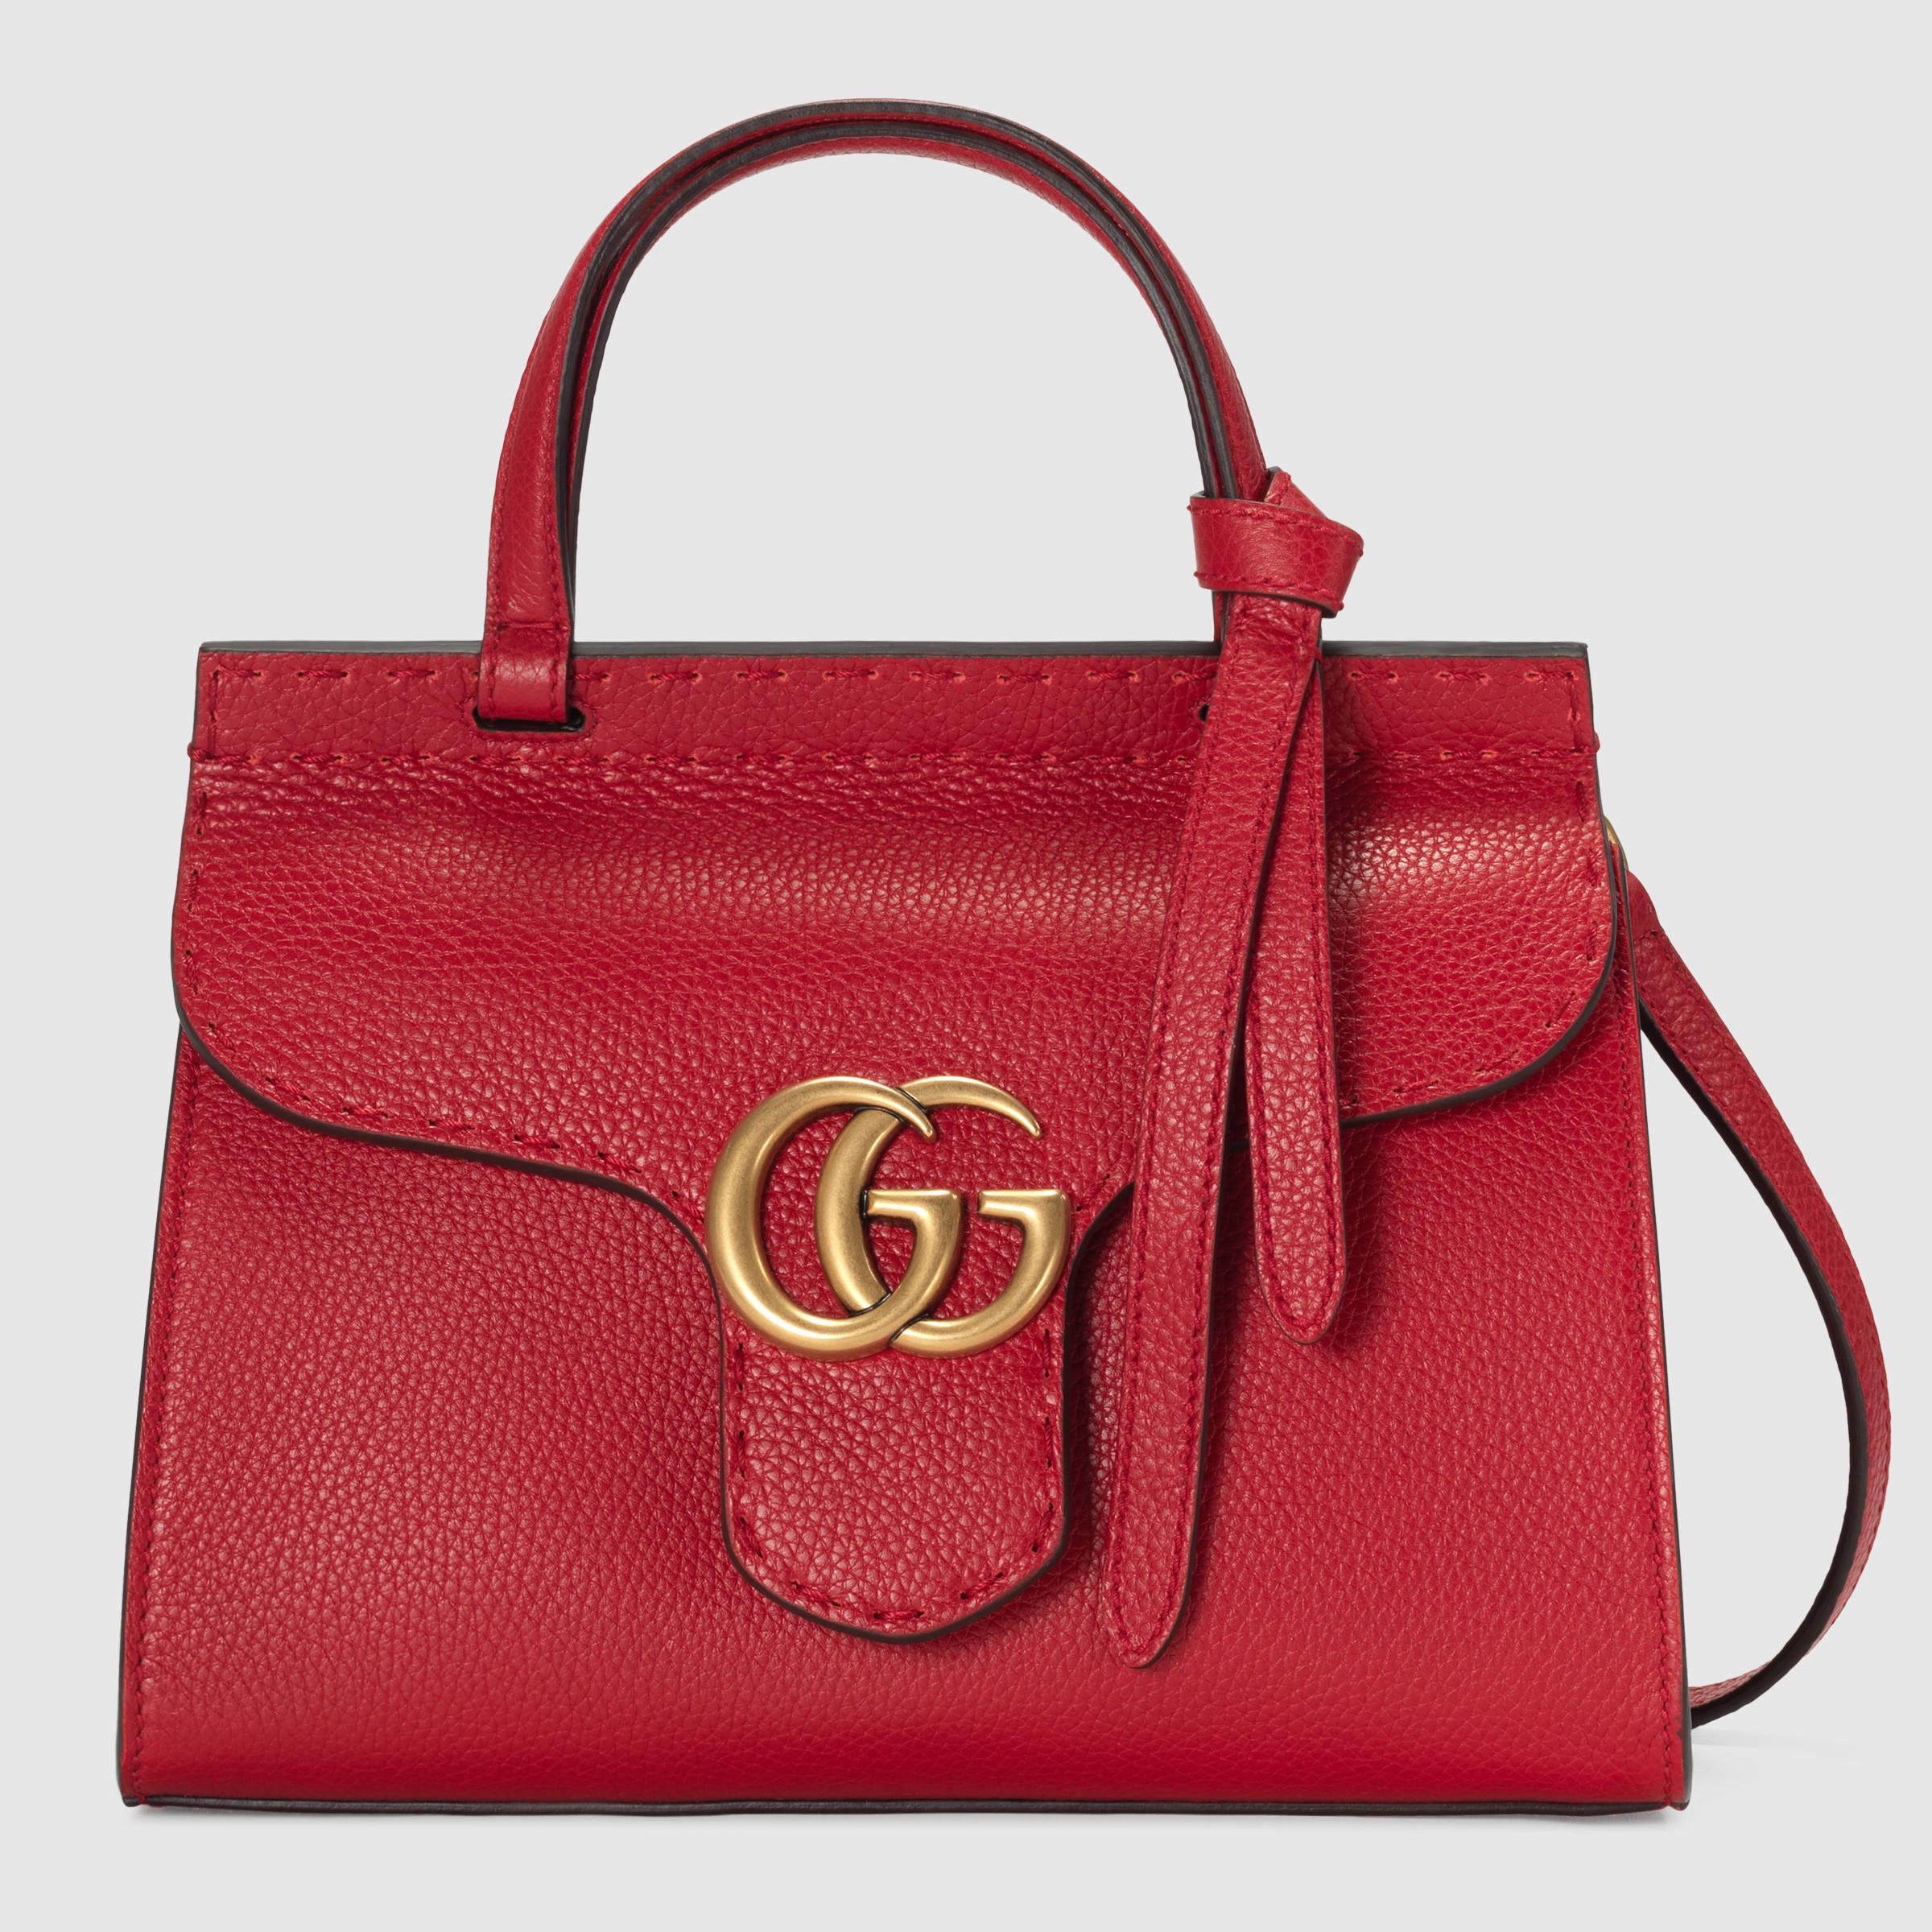 afc44afddc24ef Gucci Gg Marmont Top Handle Bag Red. Gucci GG Marmont Medium Matelassé ...